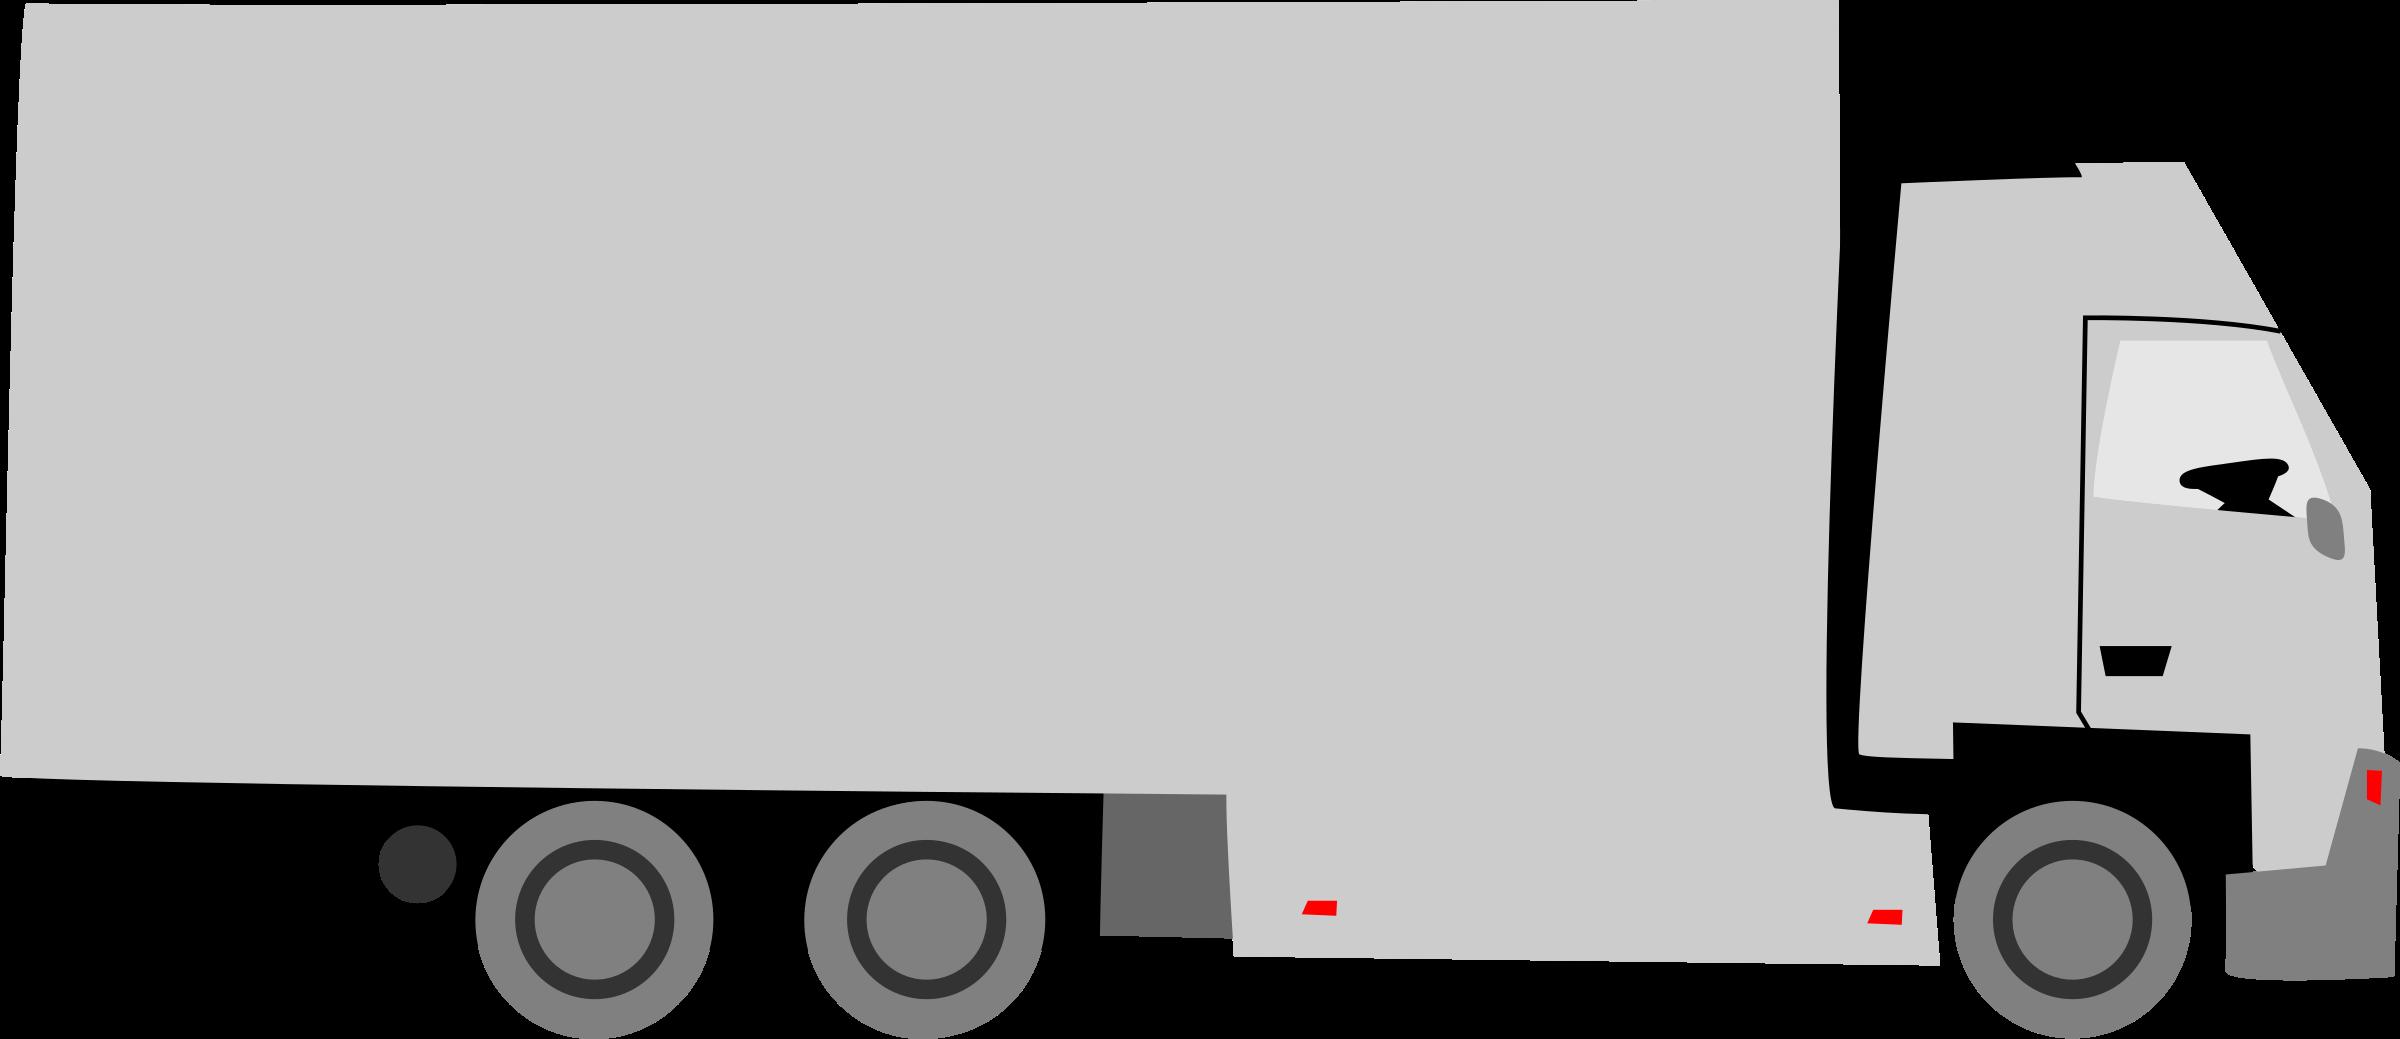 Car trailer clipart vector free Clipart - Truck vector free